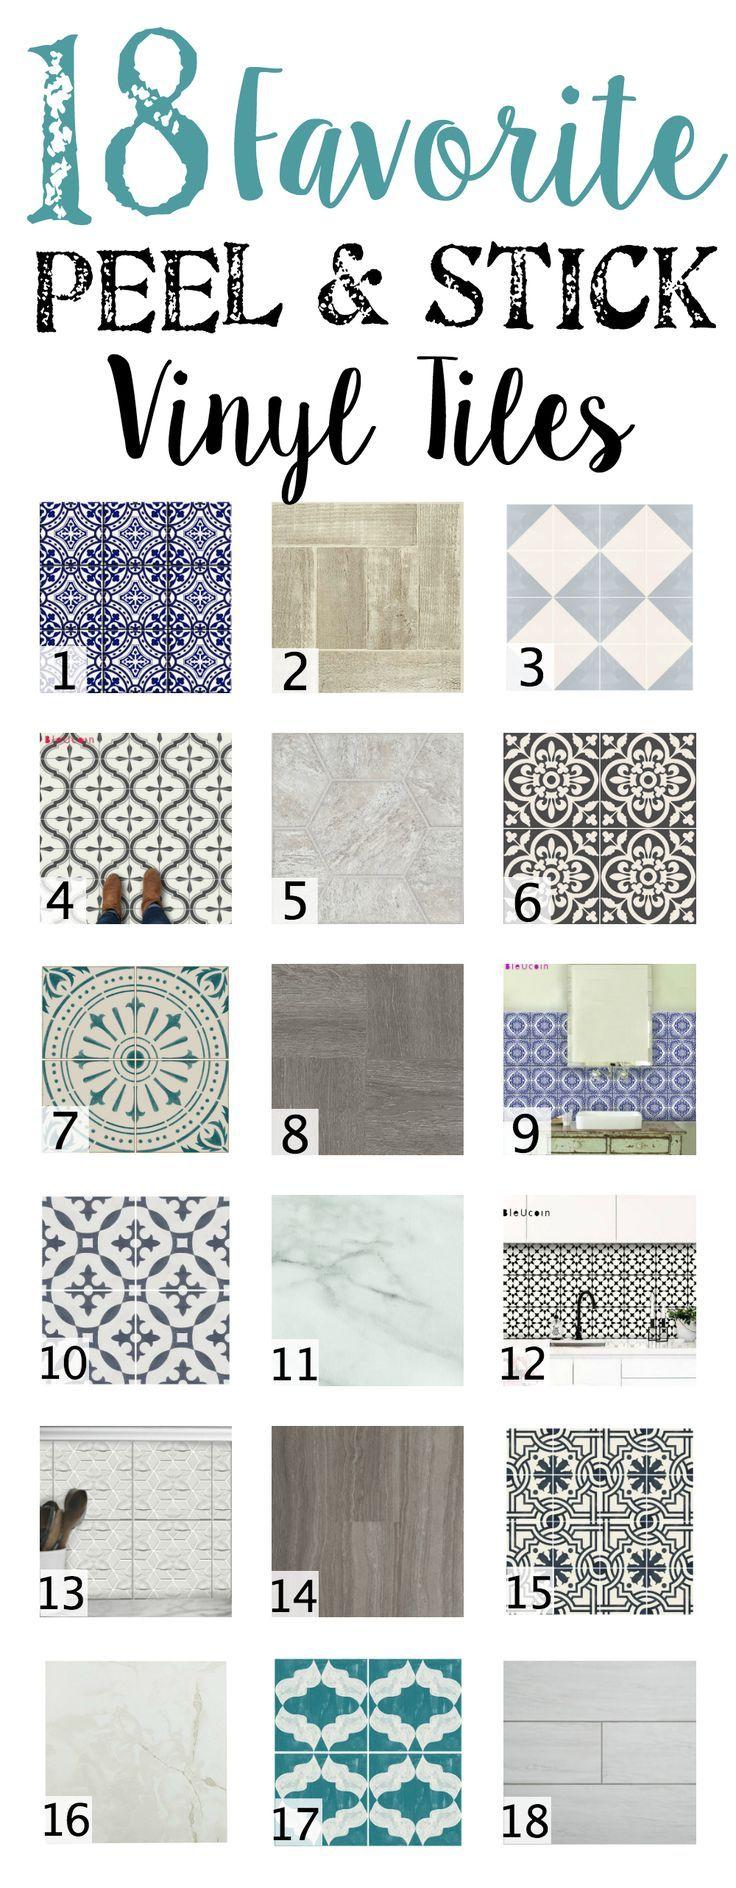 18 Favorite Peel and Stick Vinyl Tiles